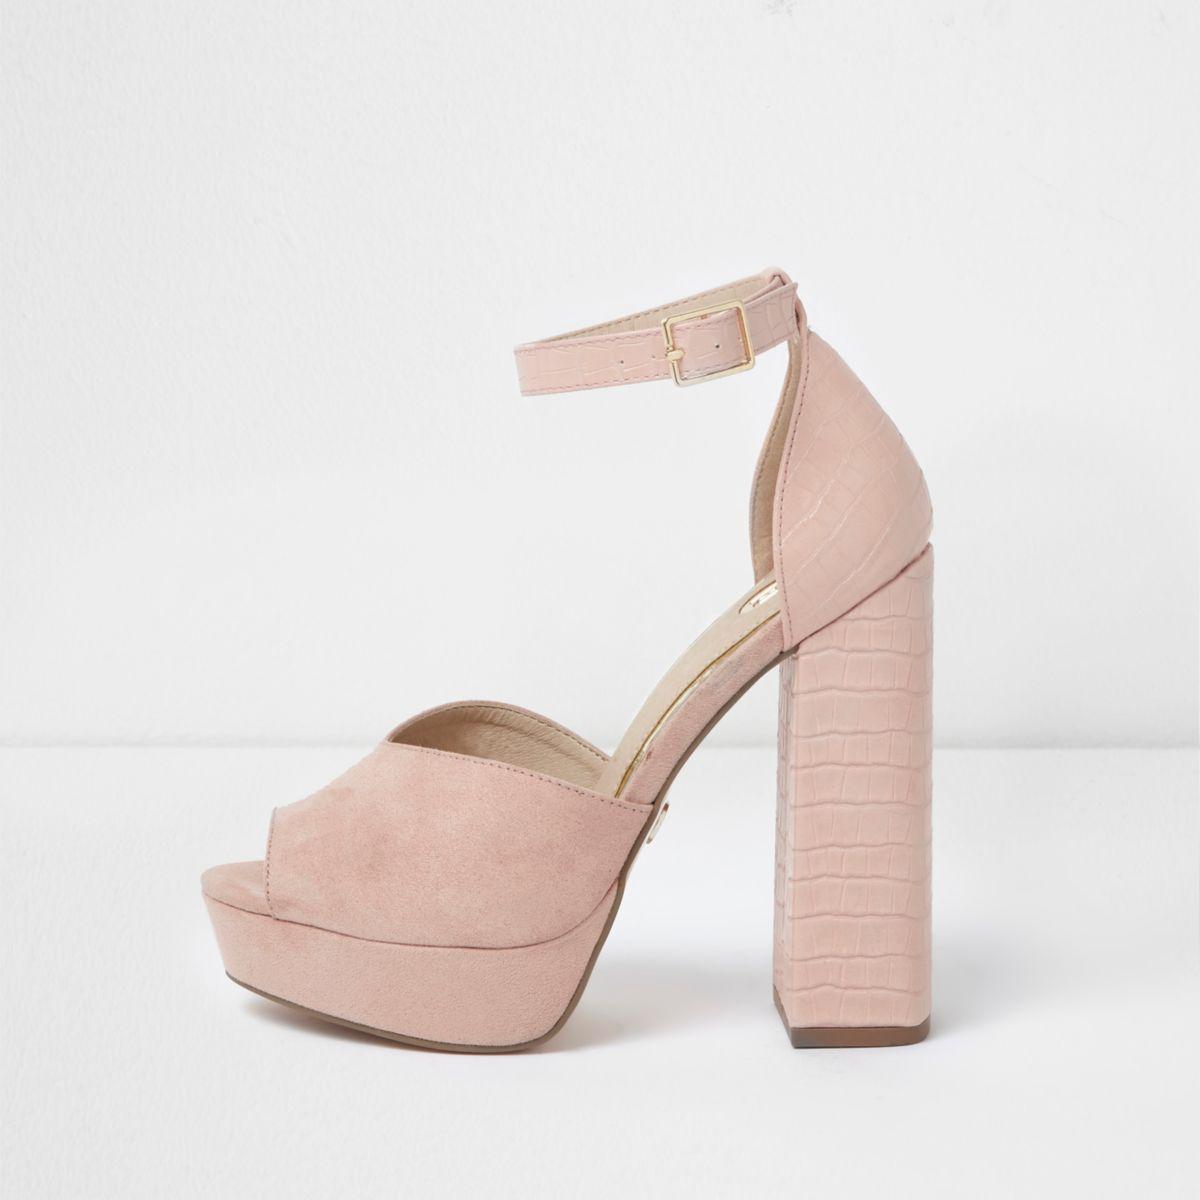 Pink peep toe platform sandals